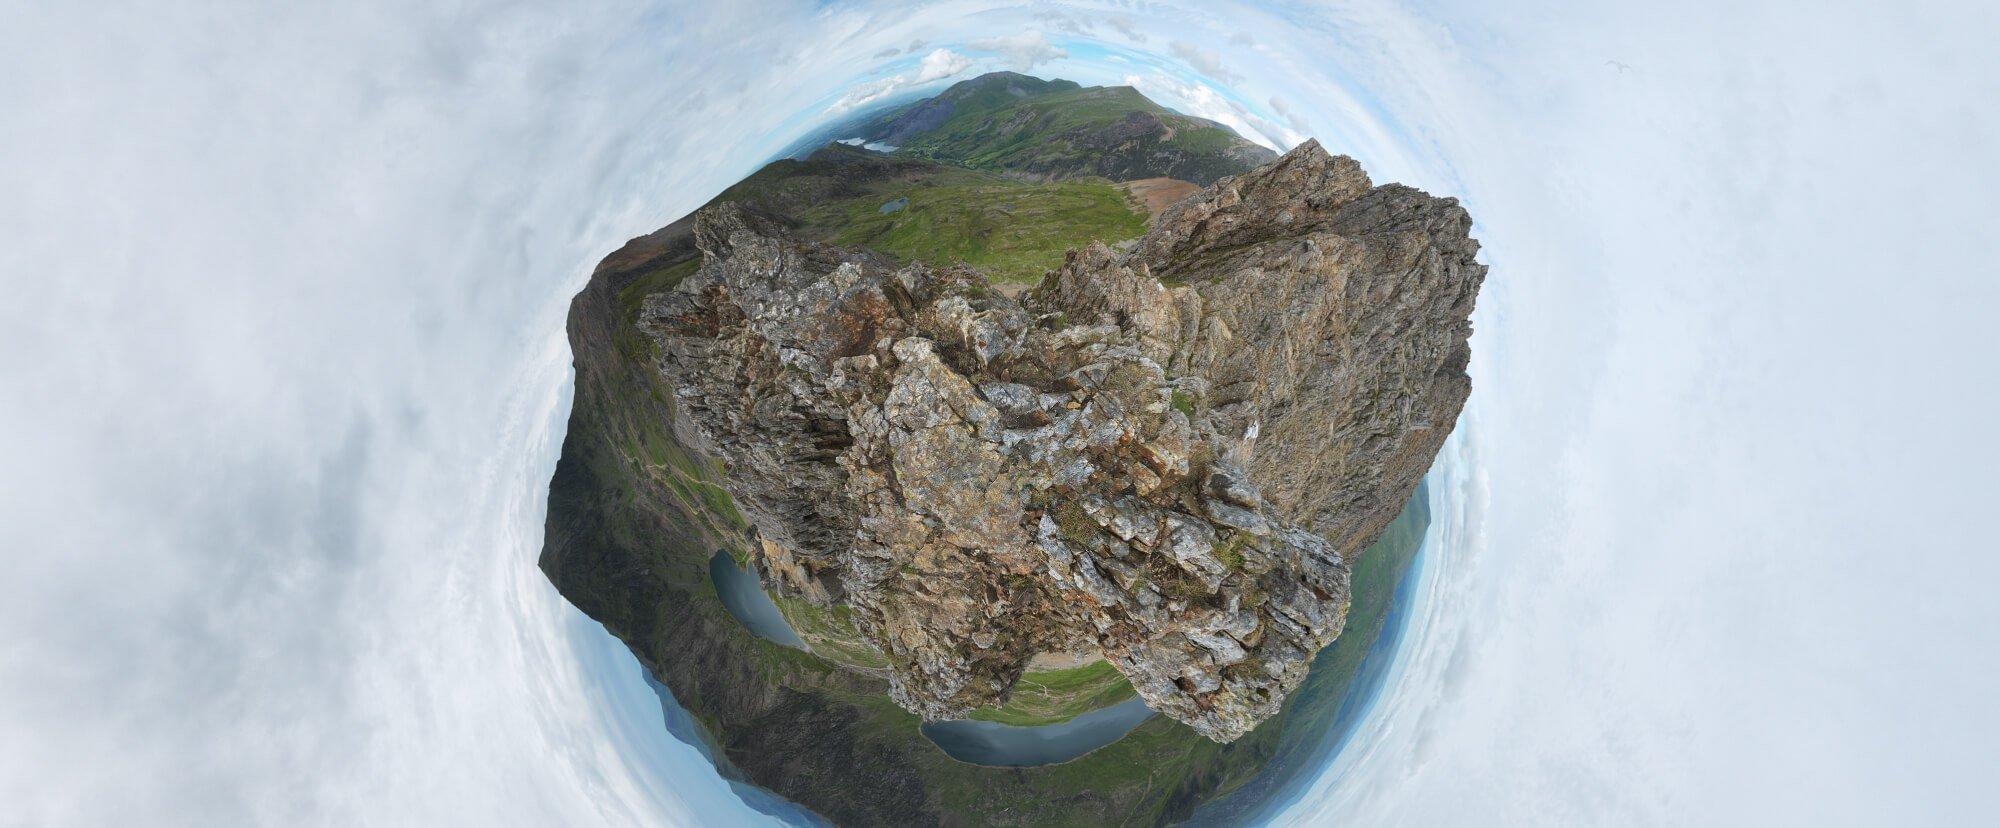 virtual tour exploration cribb goch